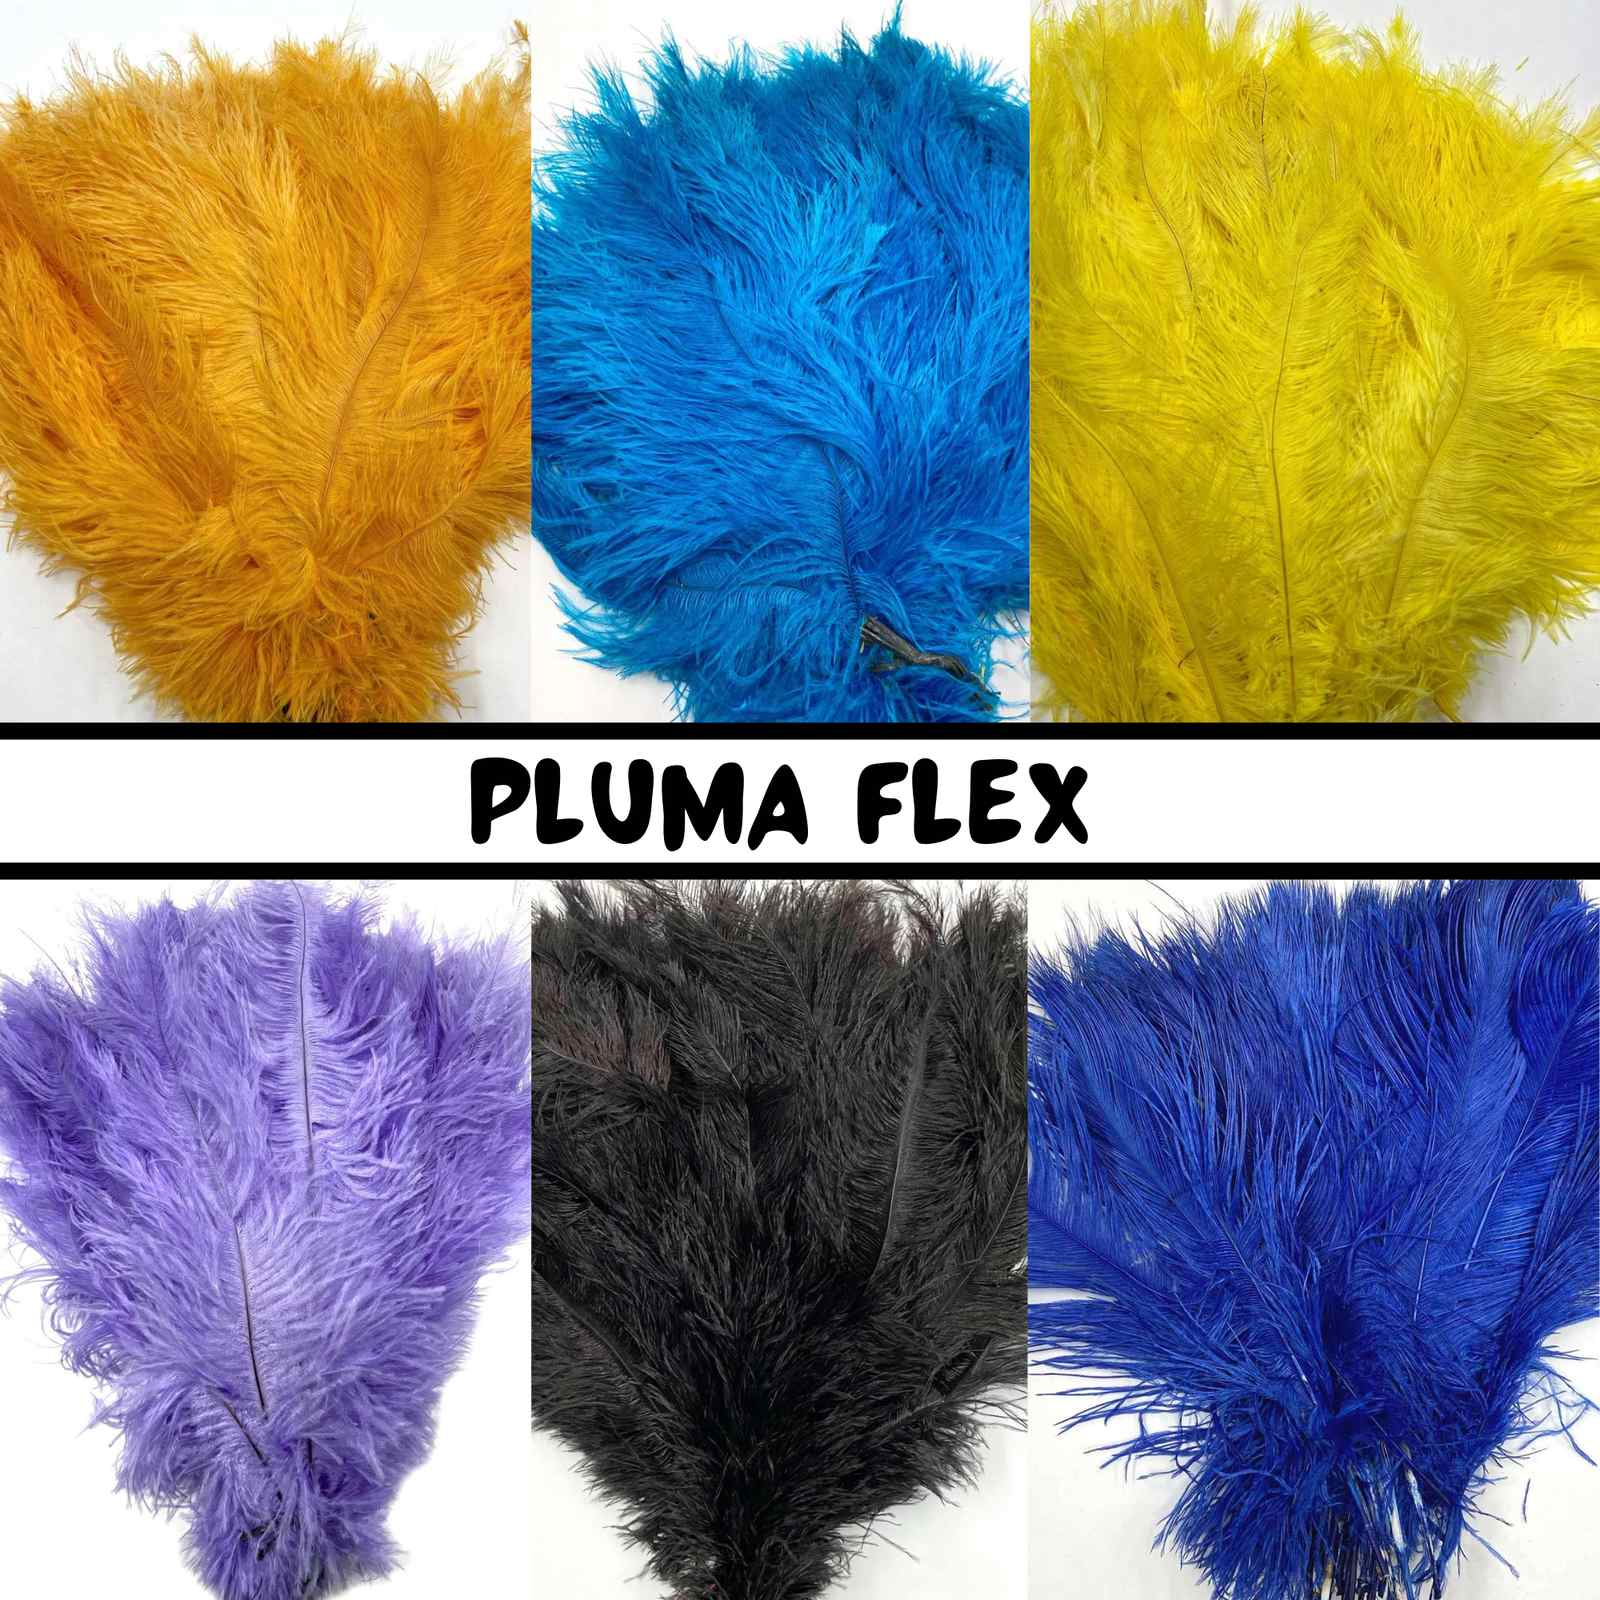 Pluma Flex - 10 unidades